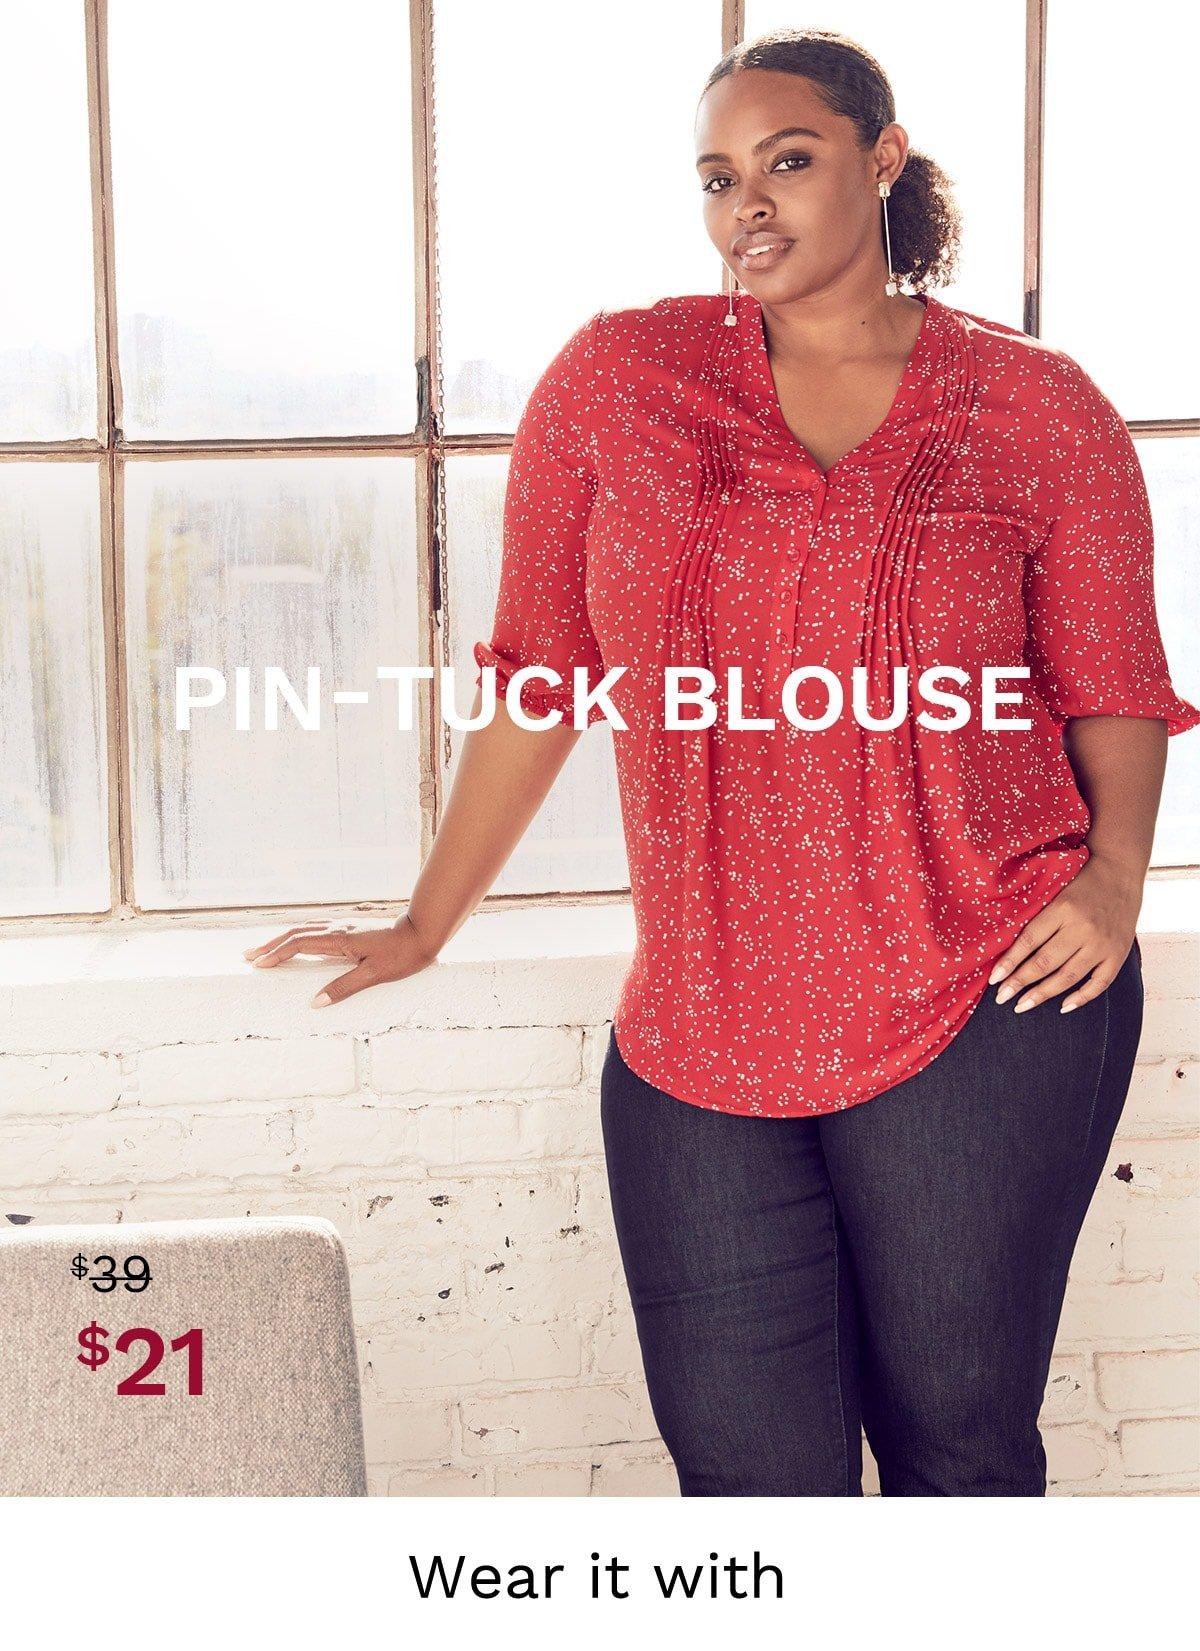 Pin-Tuck Blouse